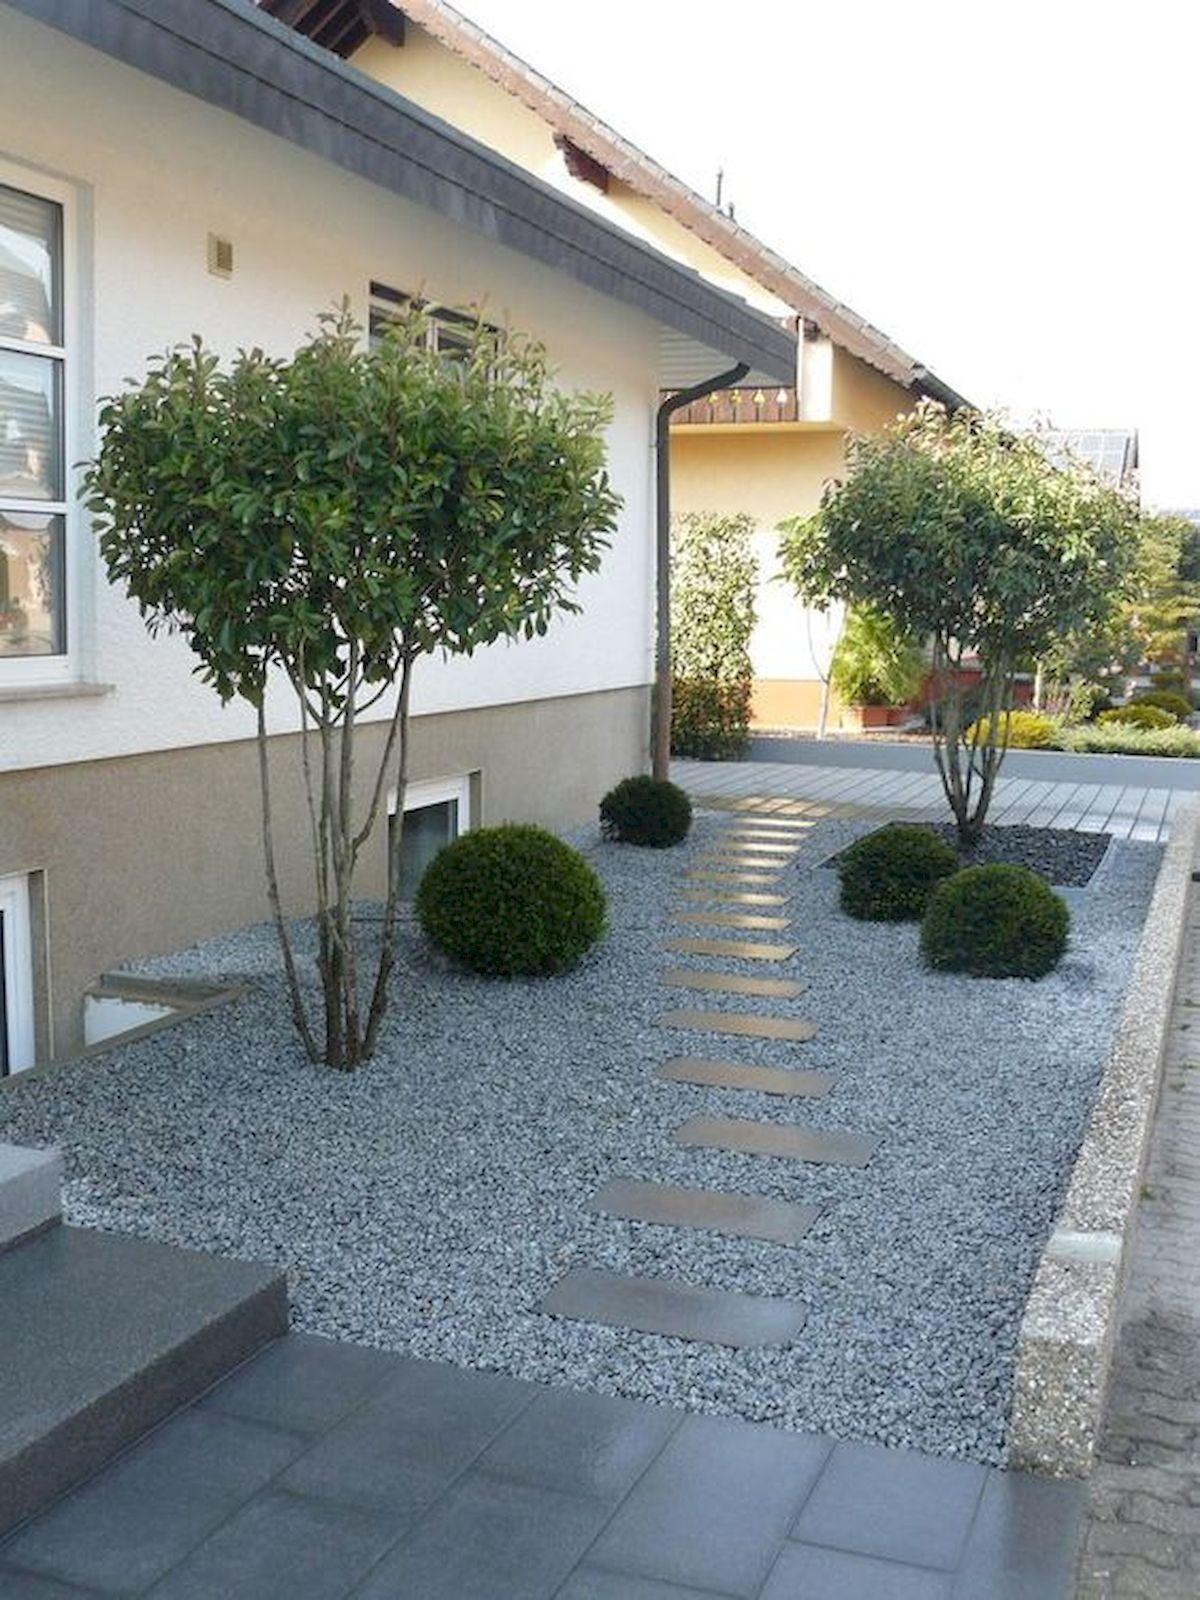 70 Magical Side Yard And Backyard Gravel Garden Design Ideas #sideyards